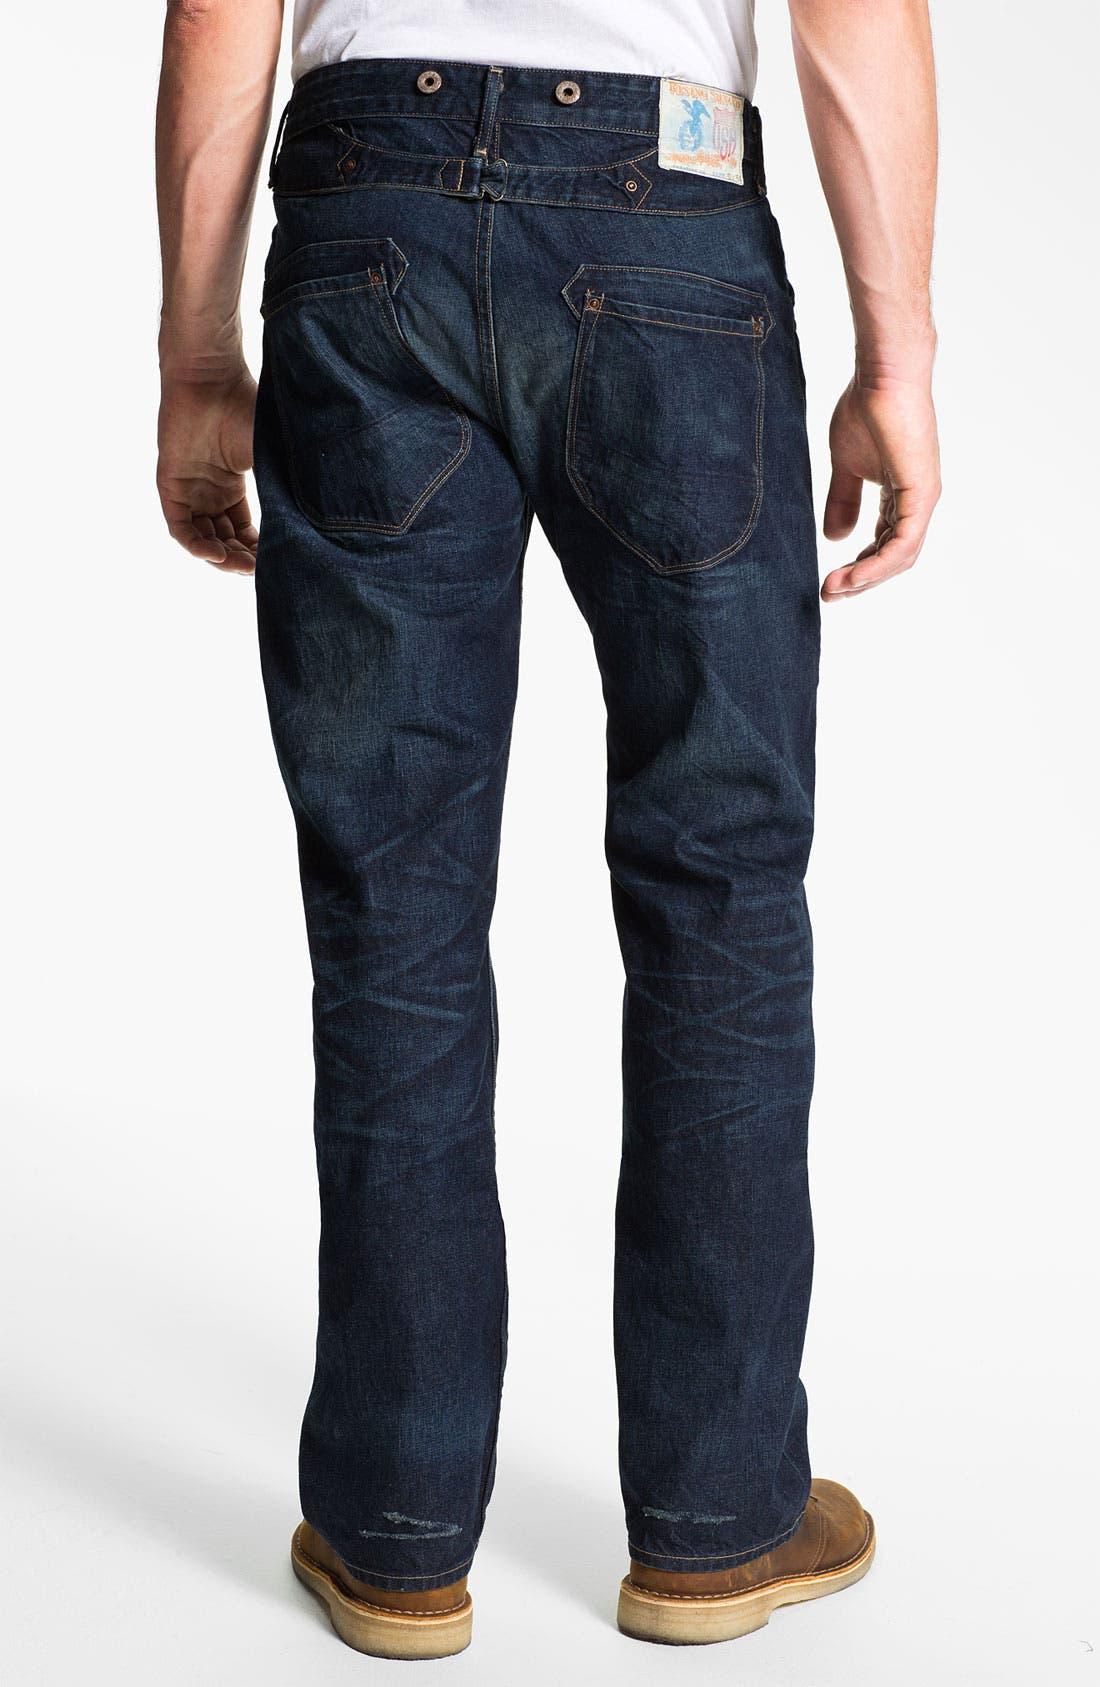 Alternate Image 1 Selected - Rising Sun 'Blacksmith' Relaxed Straight Leg Jeans (Indigo Crossroad)